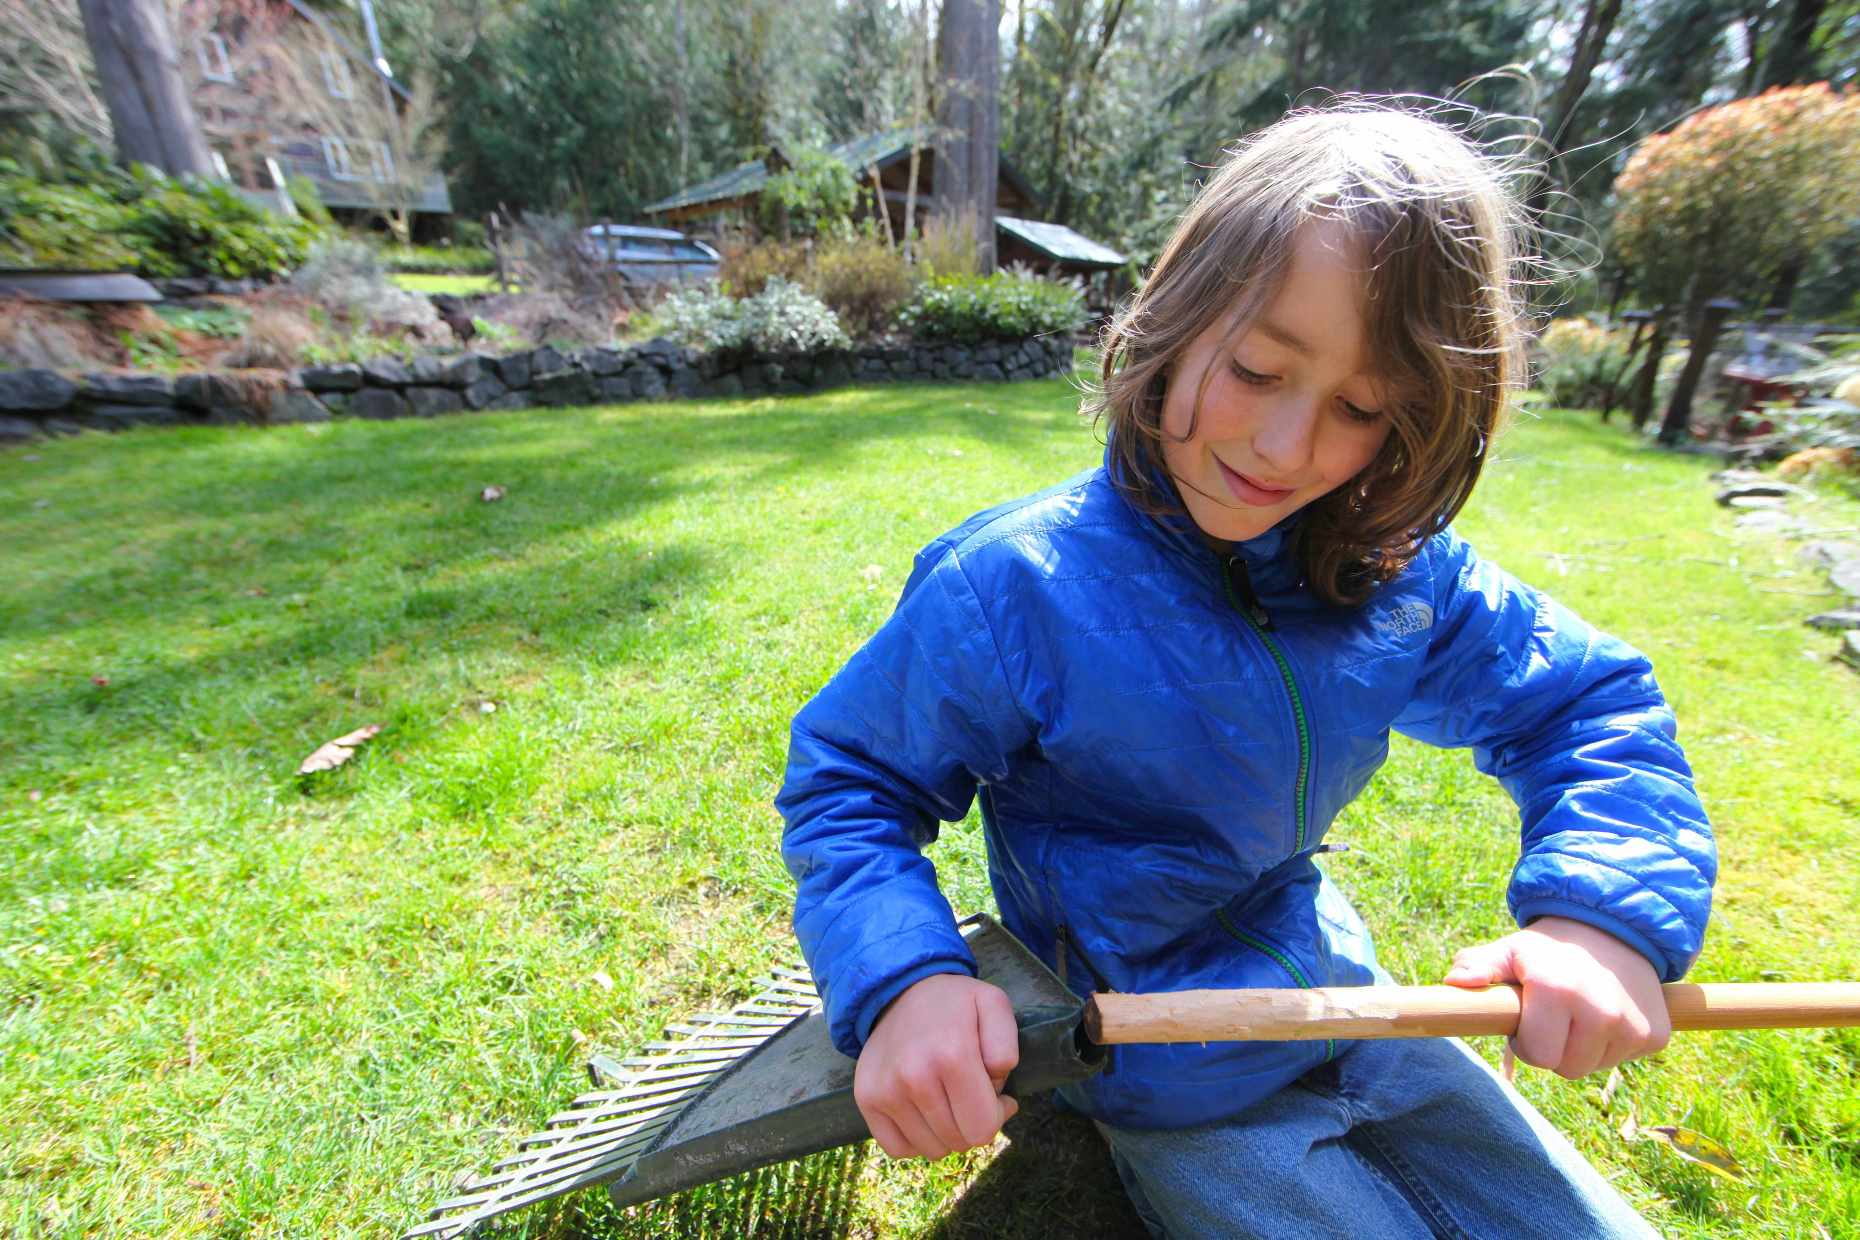 Replacing the broken handle on an old rake took 15 minutes. Photo © Liesl Clark